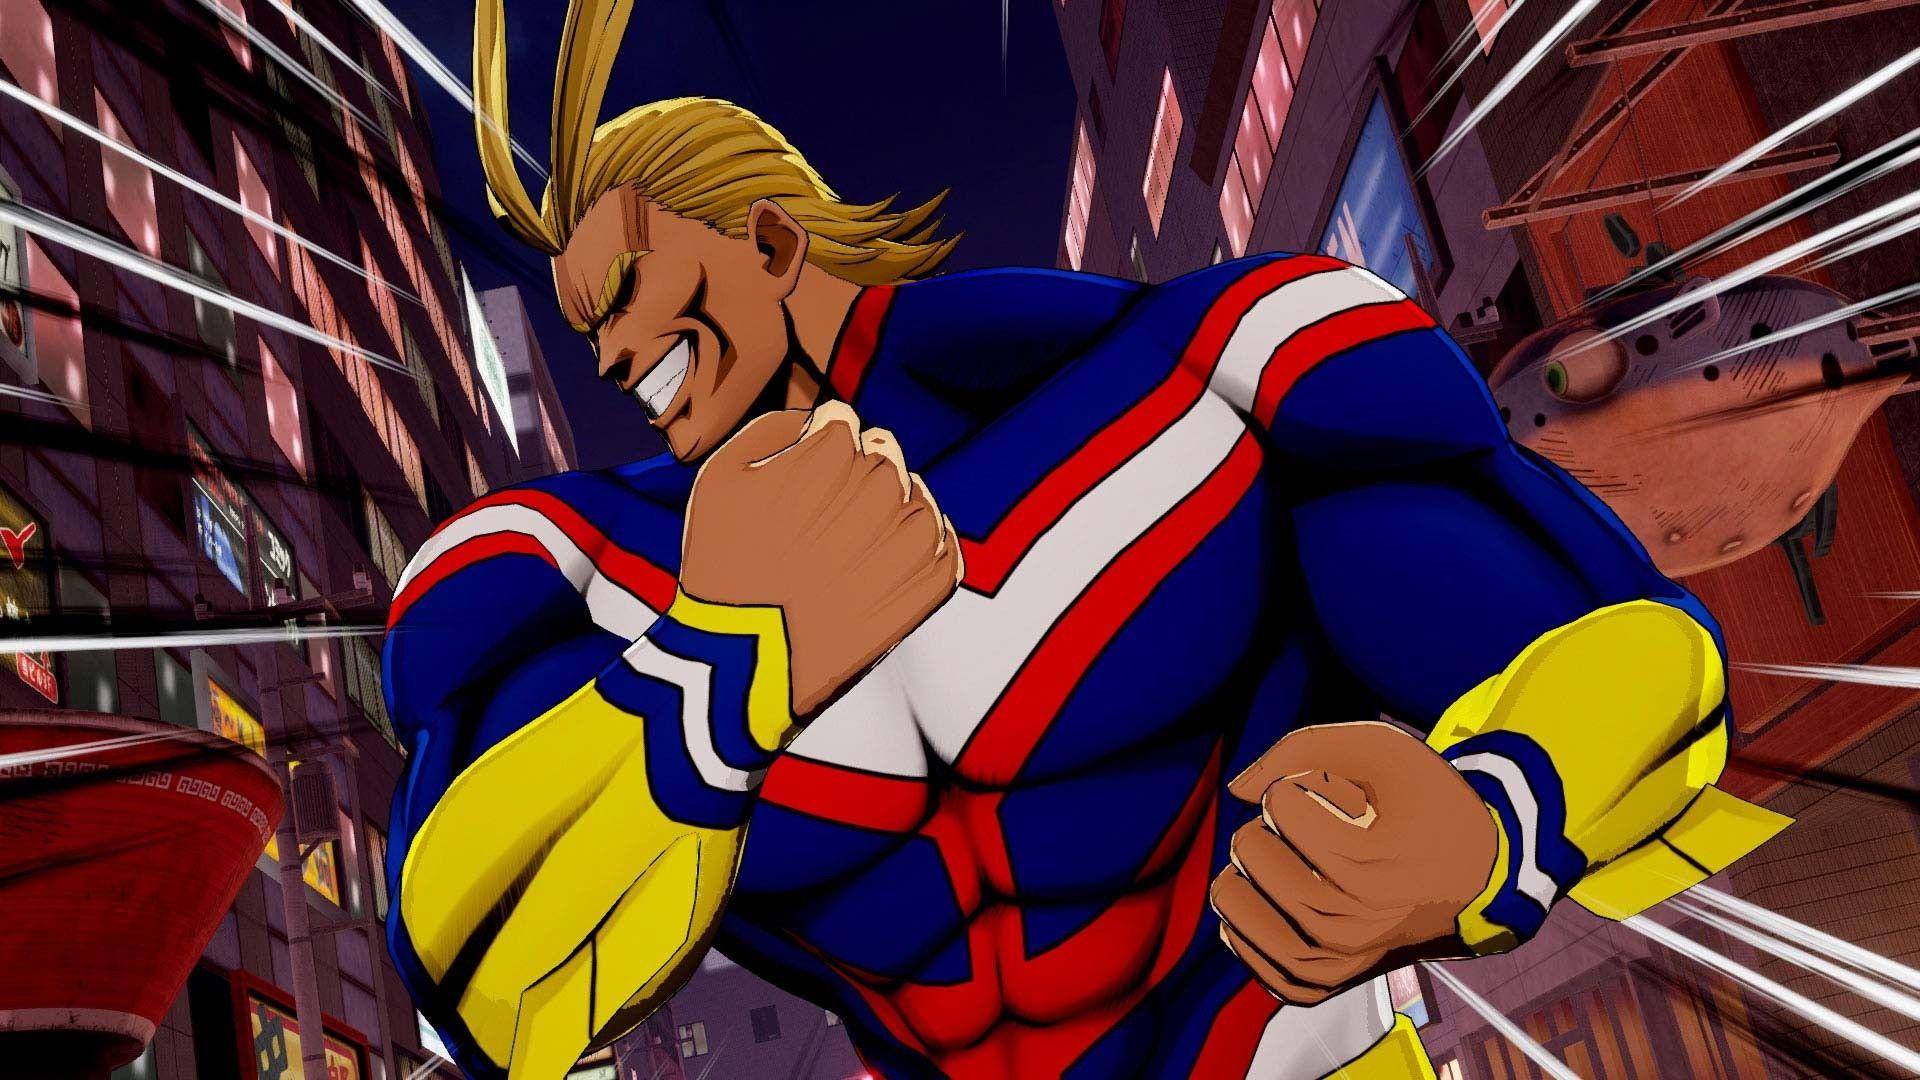 Pin By Slxxpy Head On Boku No Hero Academia My Hero Academia Hero Academia Characters Hero My Hero